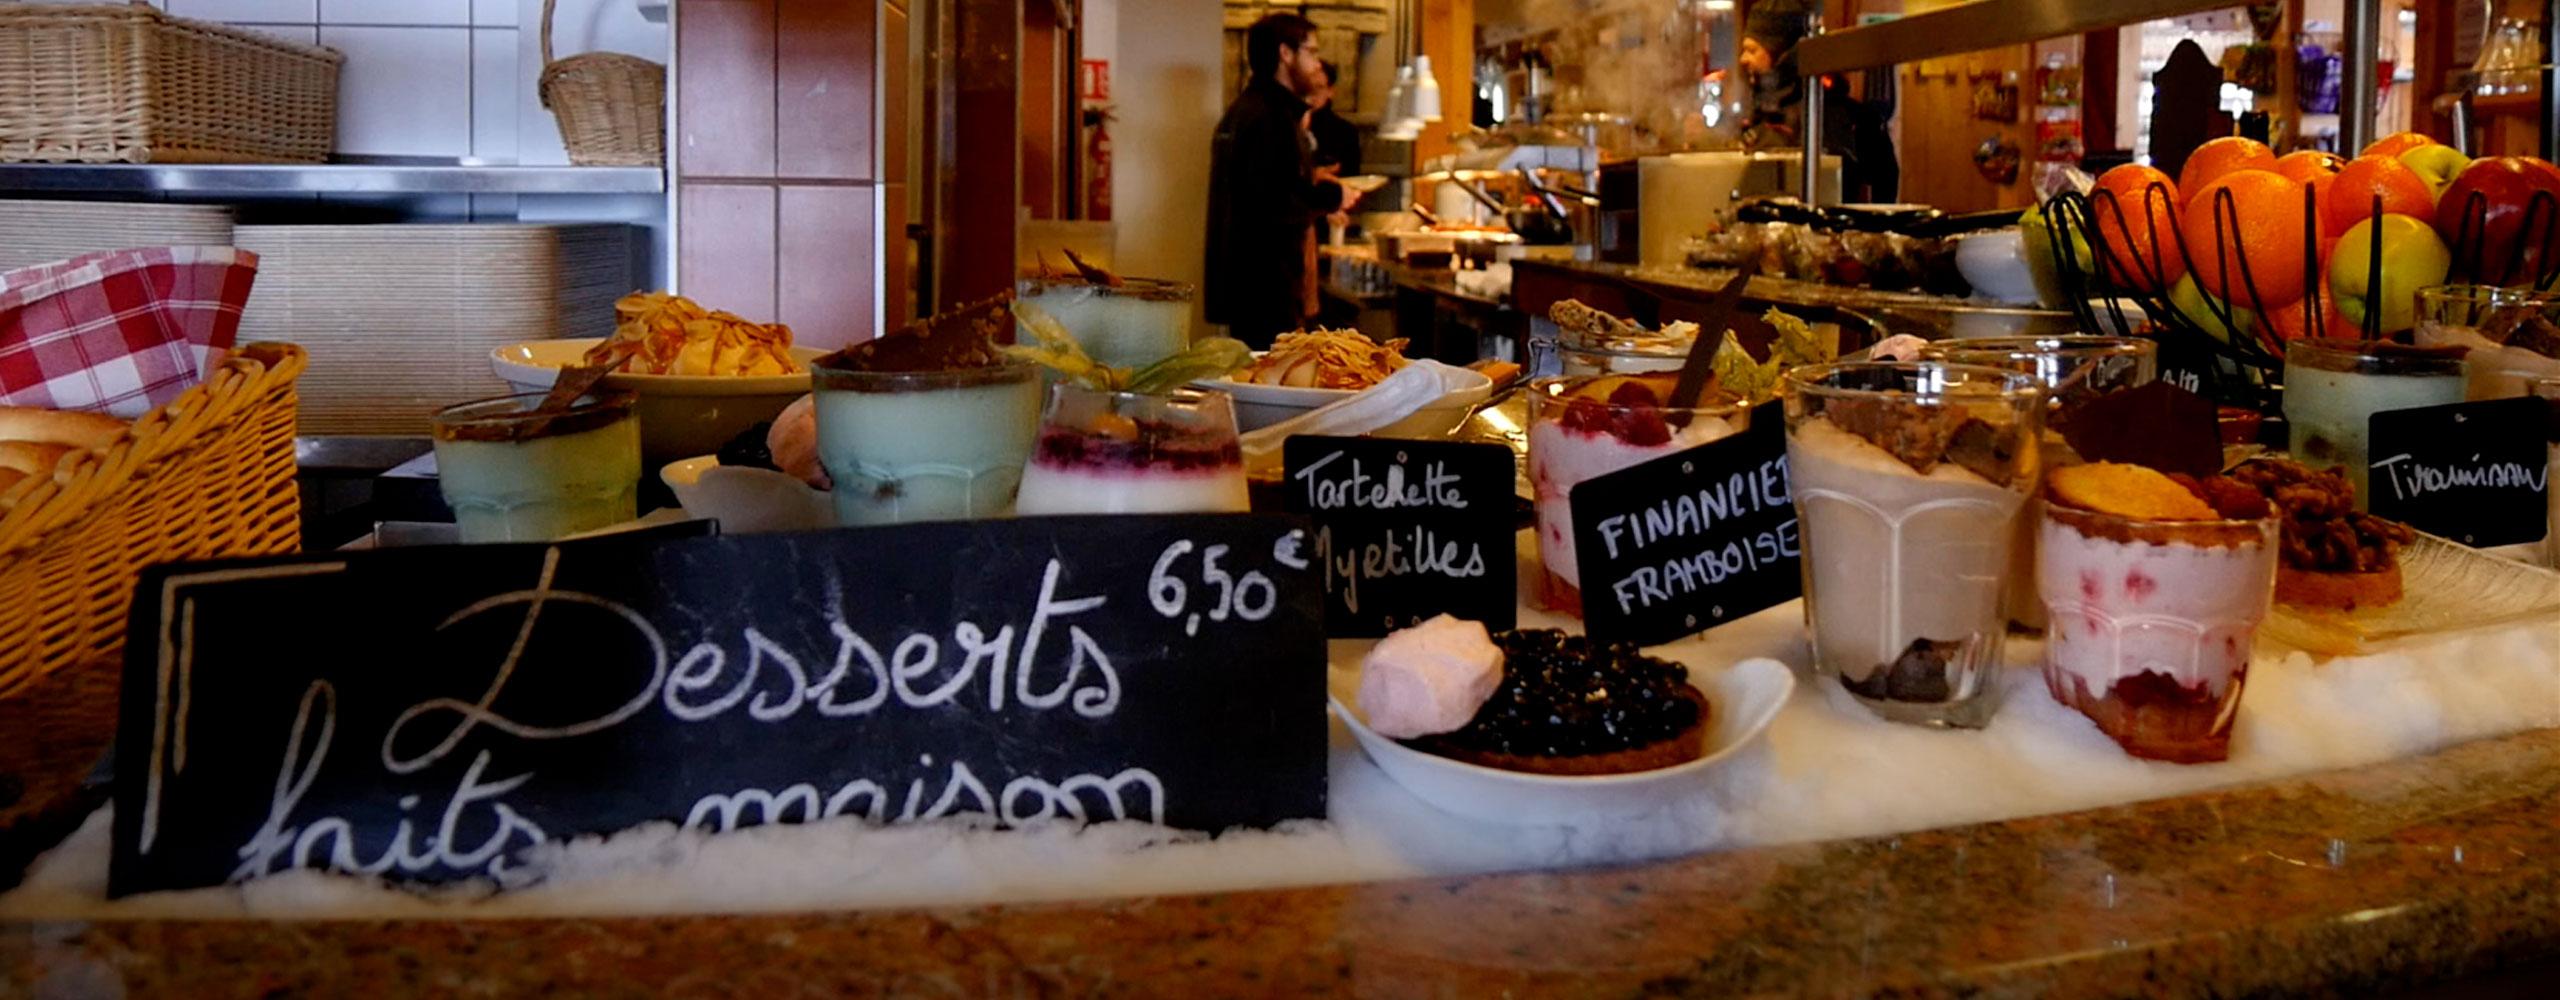 self desserts à charamillon